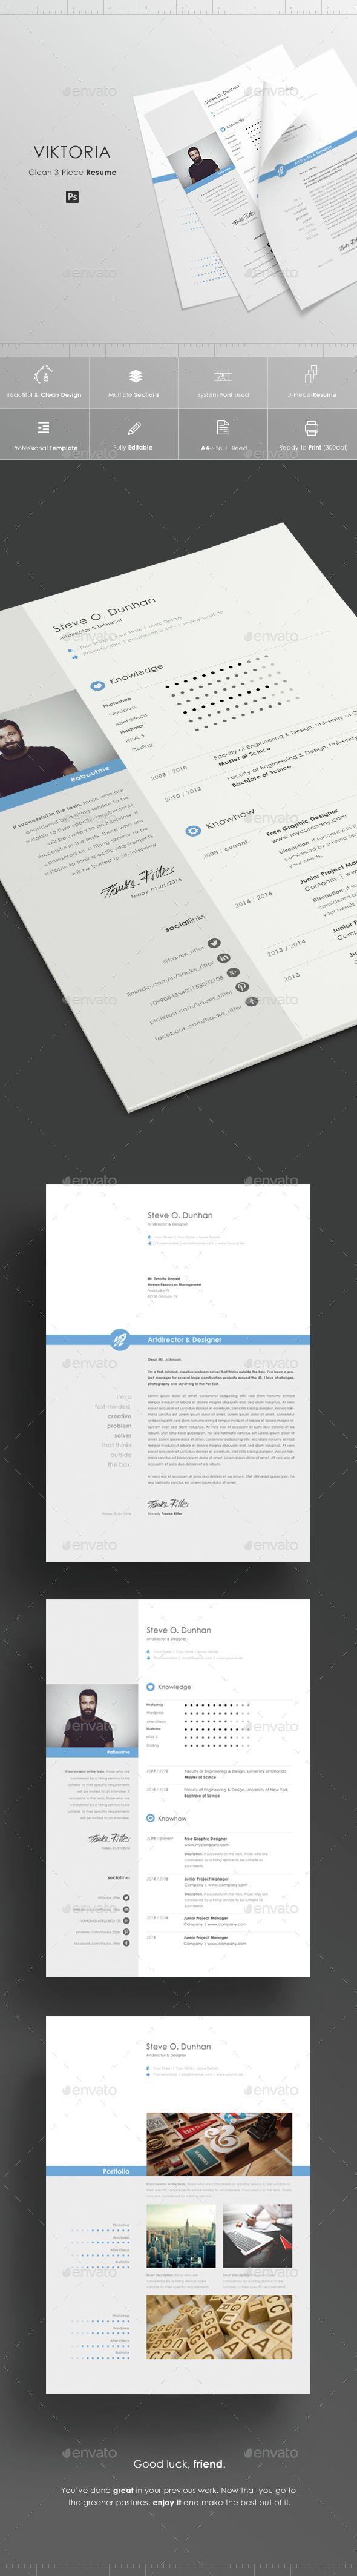 Resume Template PSD. Download here: http://graphicriver.net/item/resume/15323793?ref=ksioks